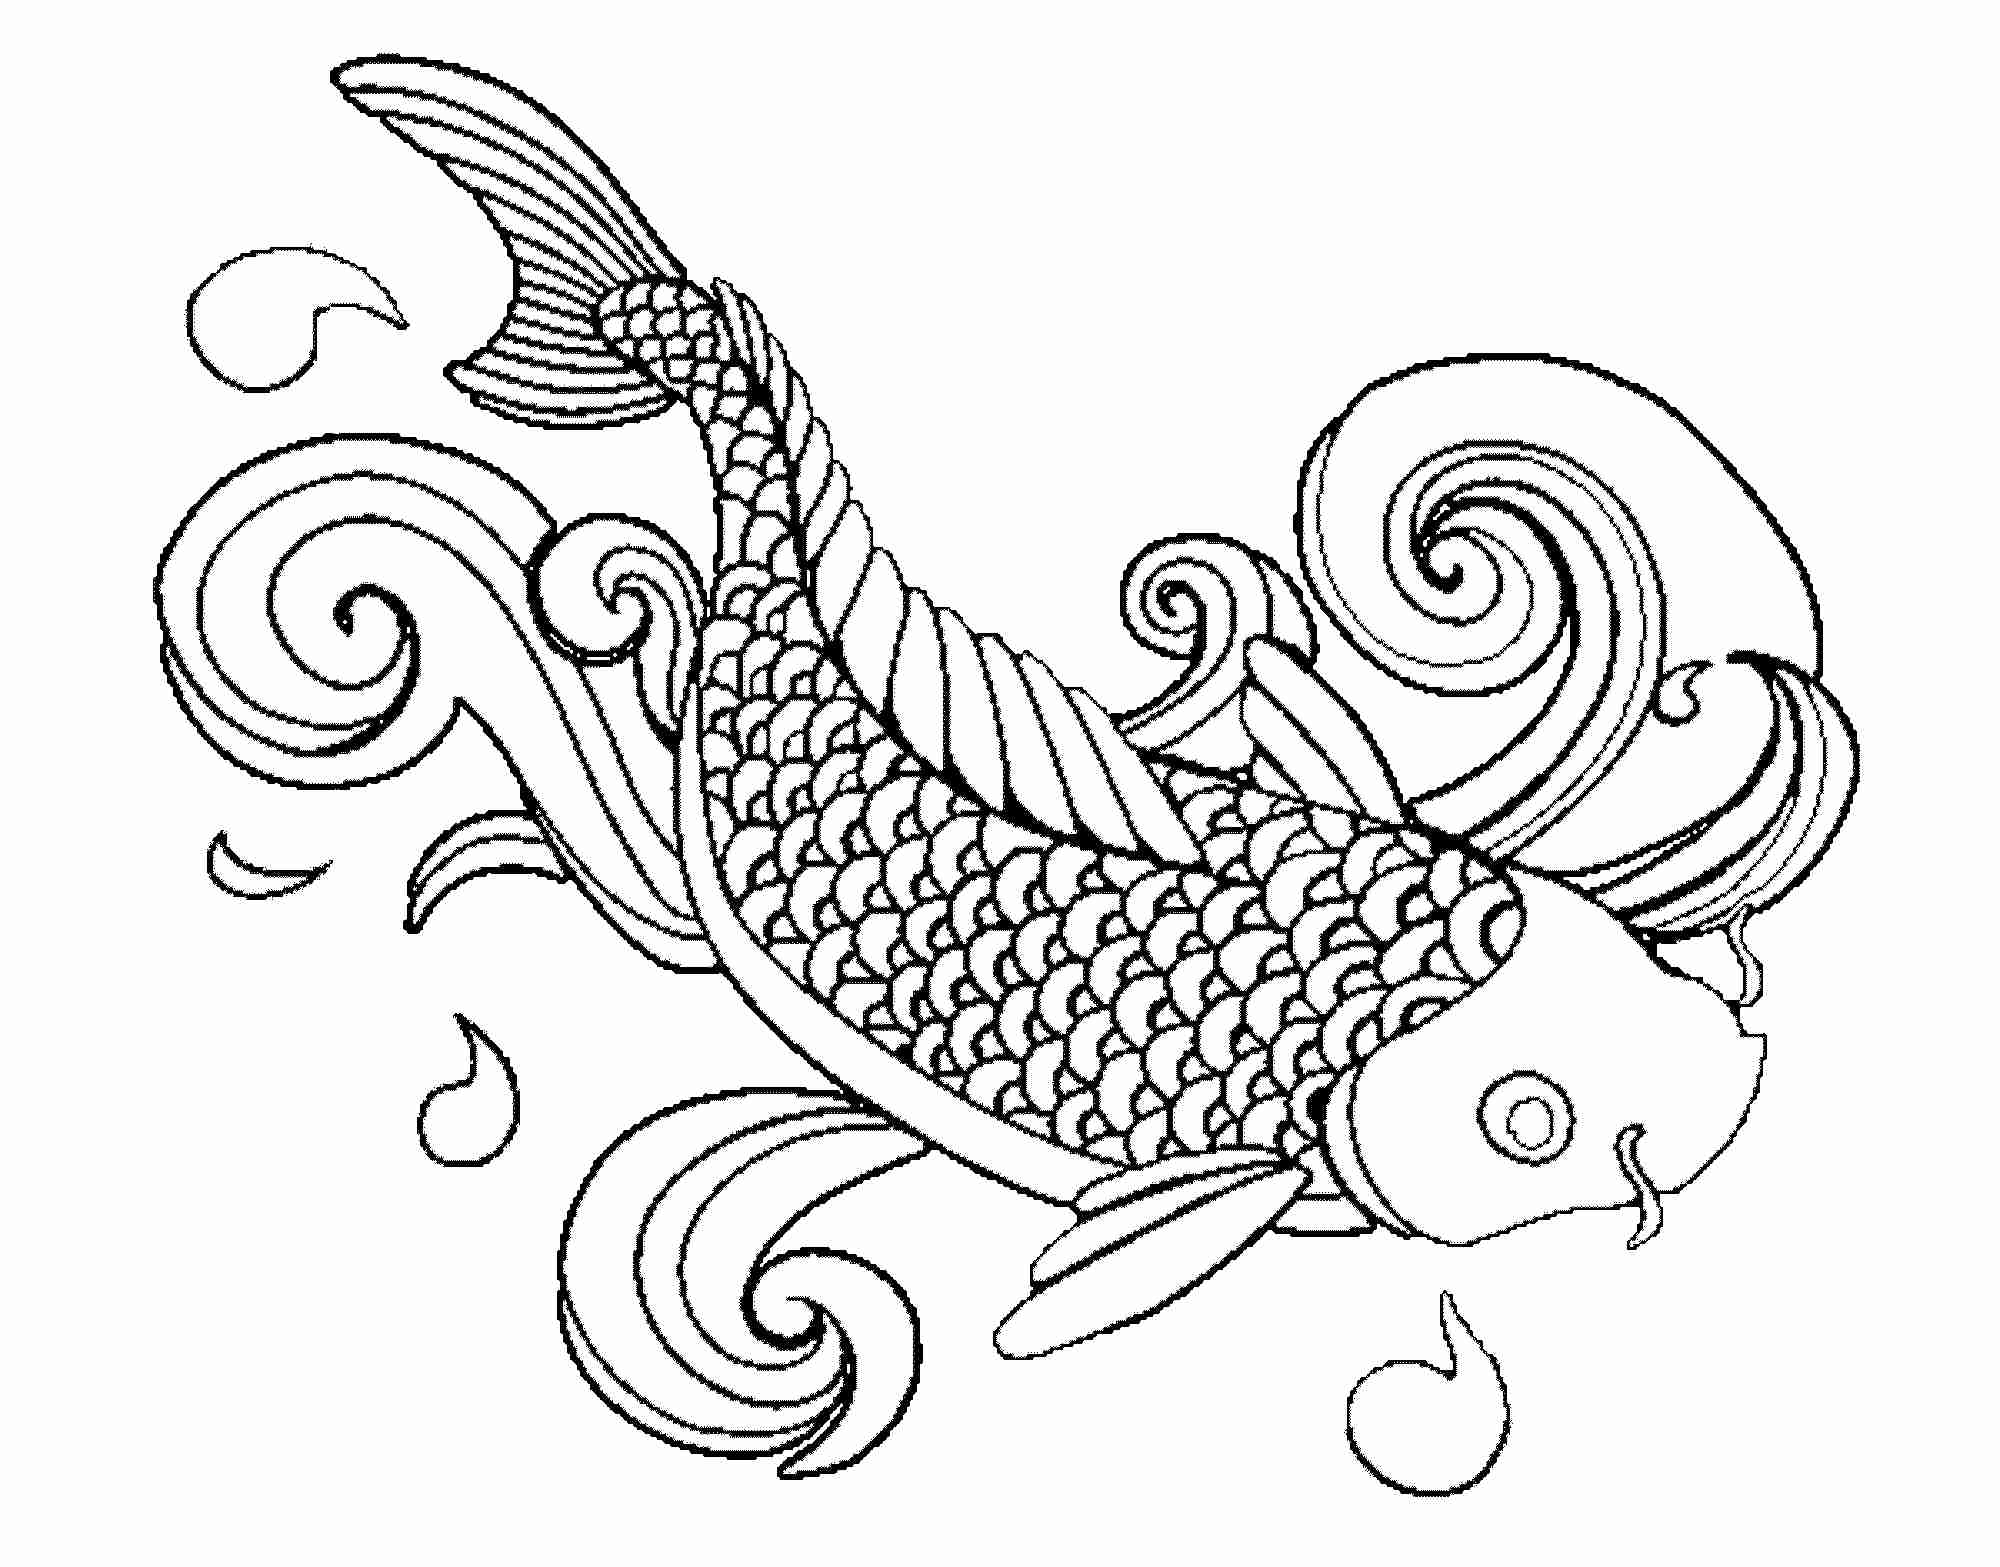 2000x1567 Coy Fish Coloring Pages Olegratiy